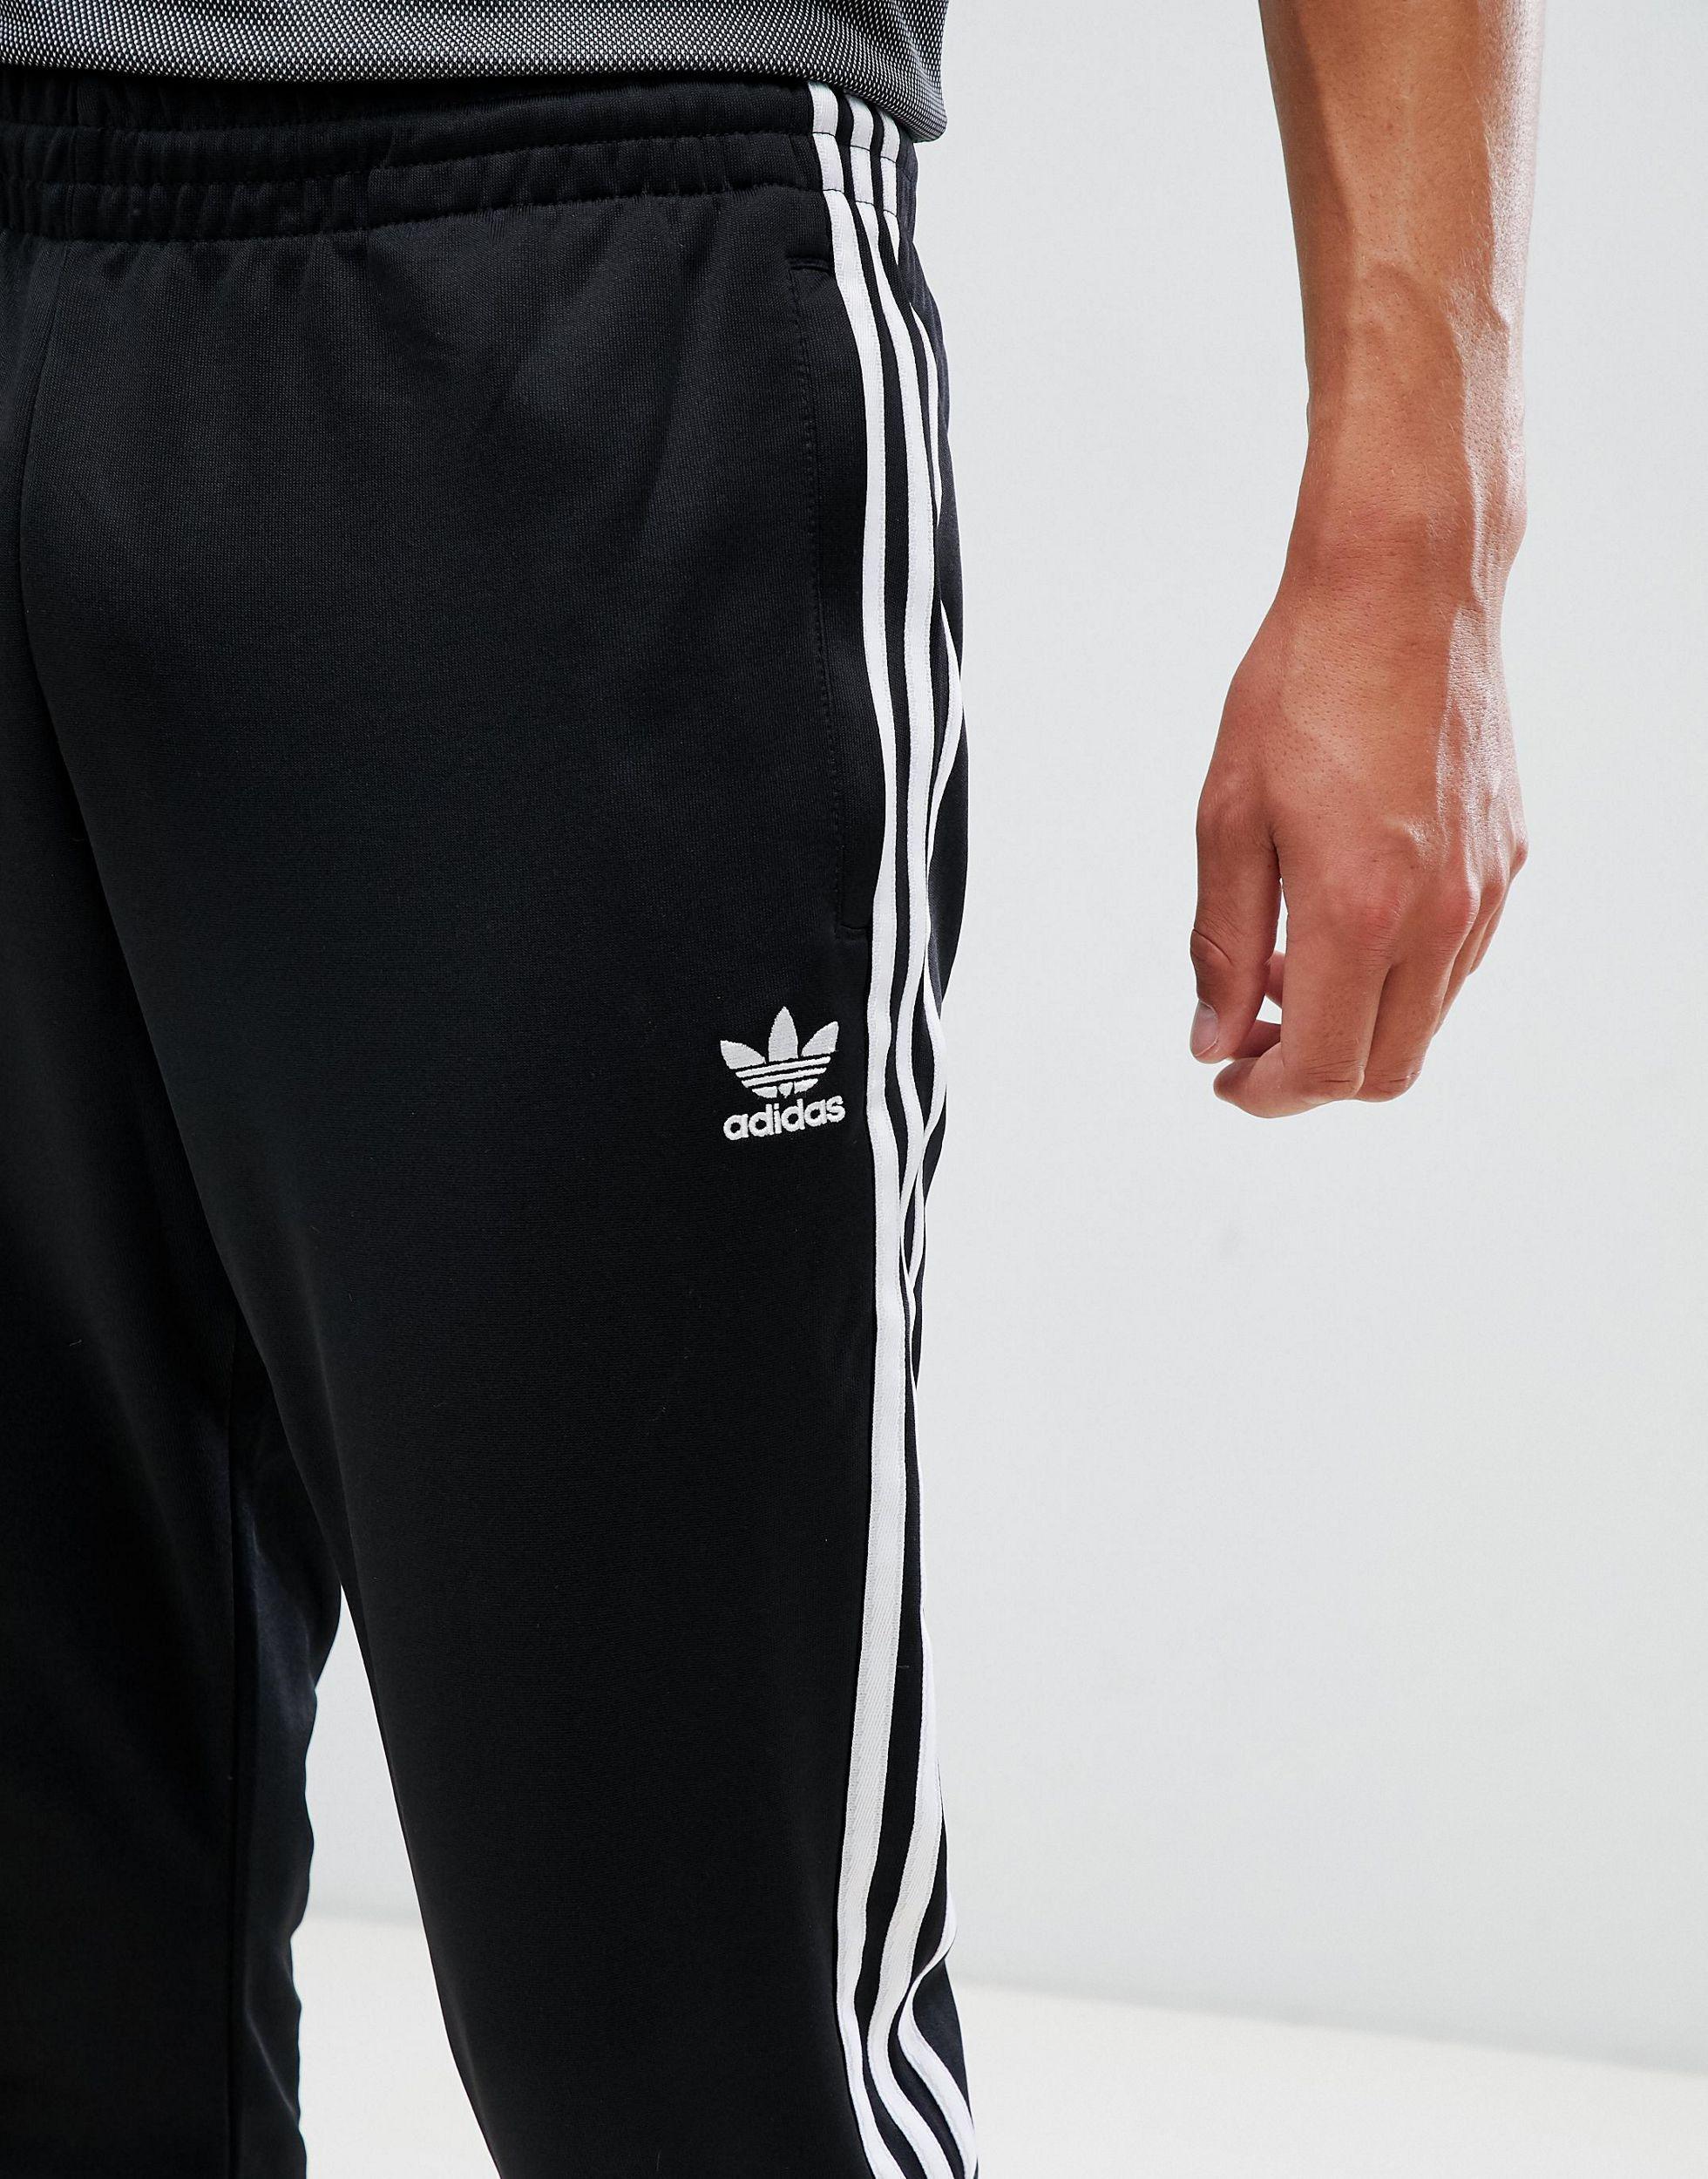 adidas Originals Superstar Sweatpants